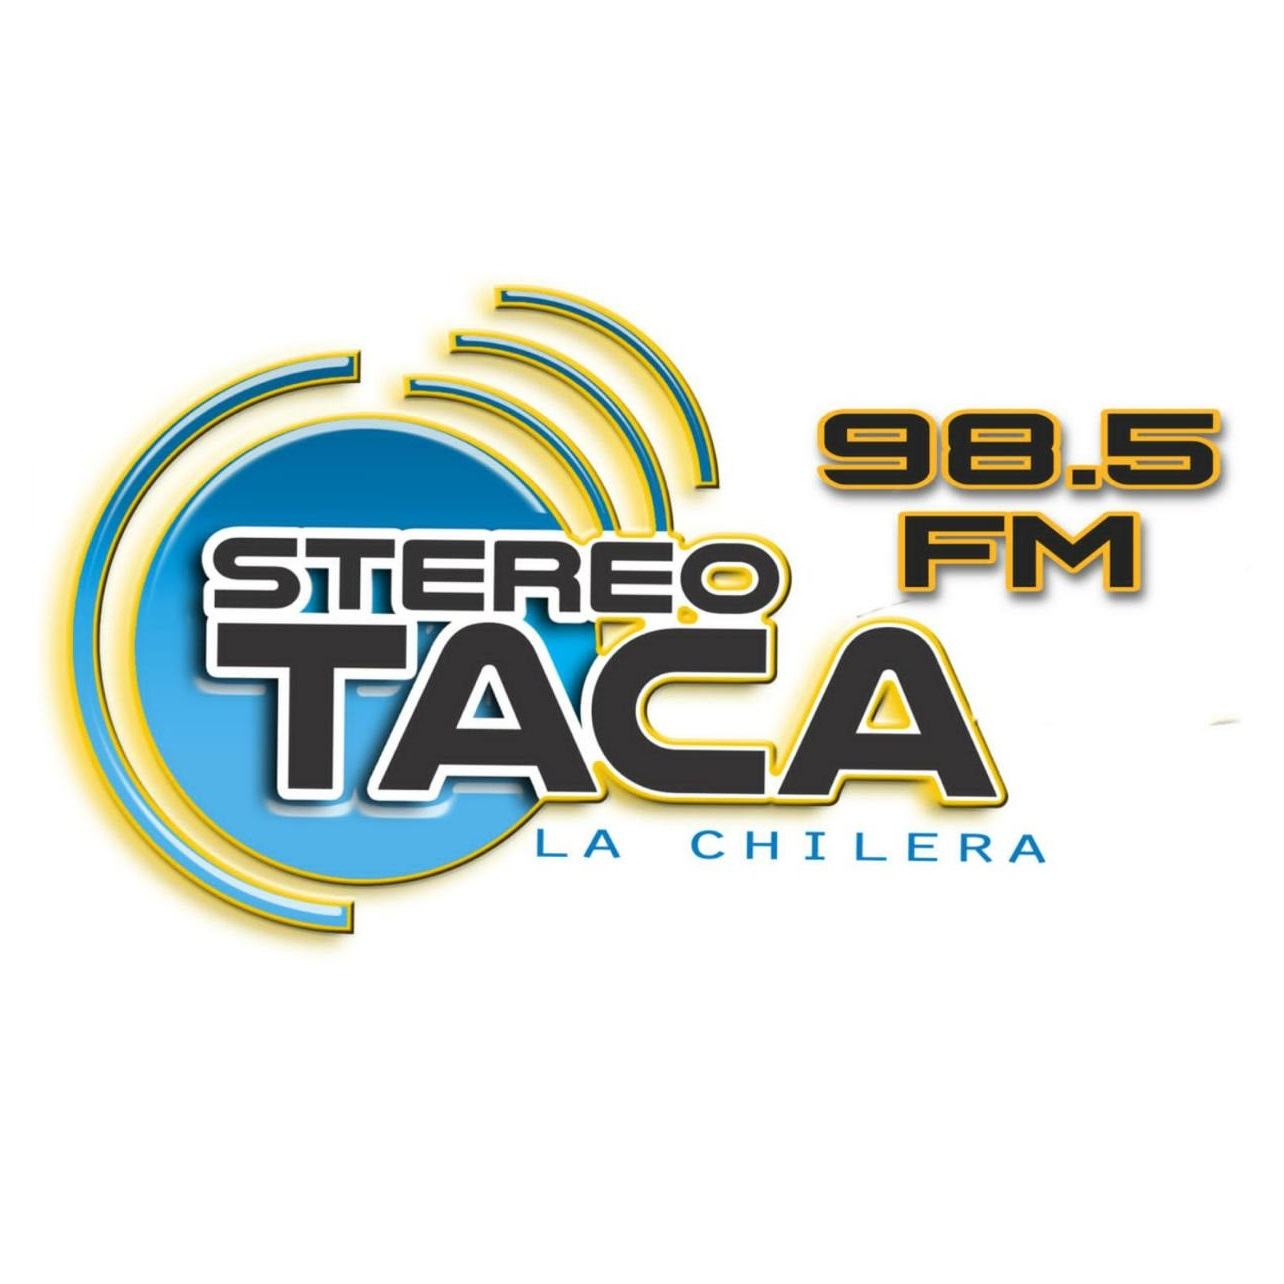 Logotipo de Stereo Taca